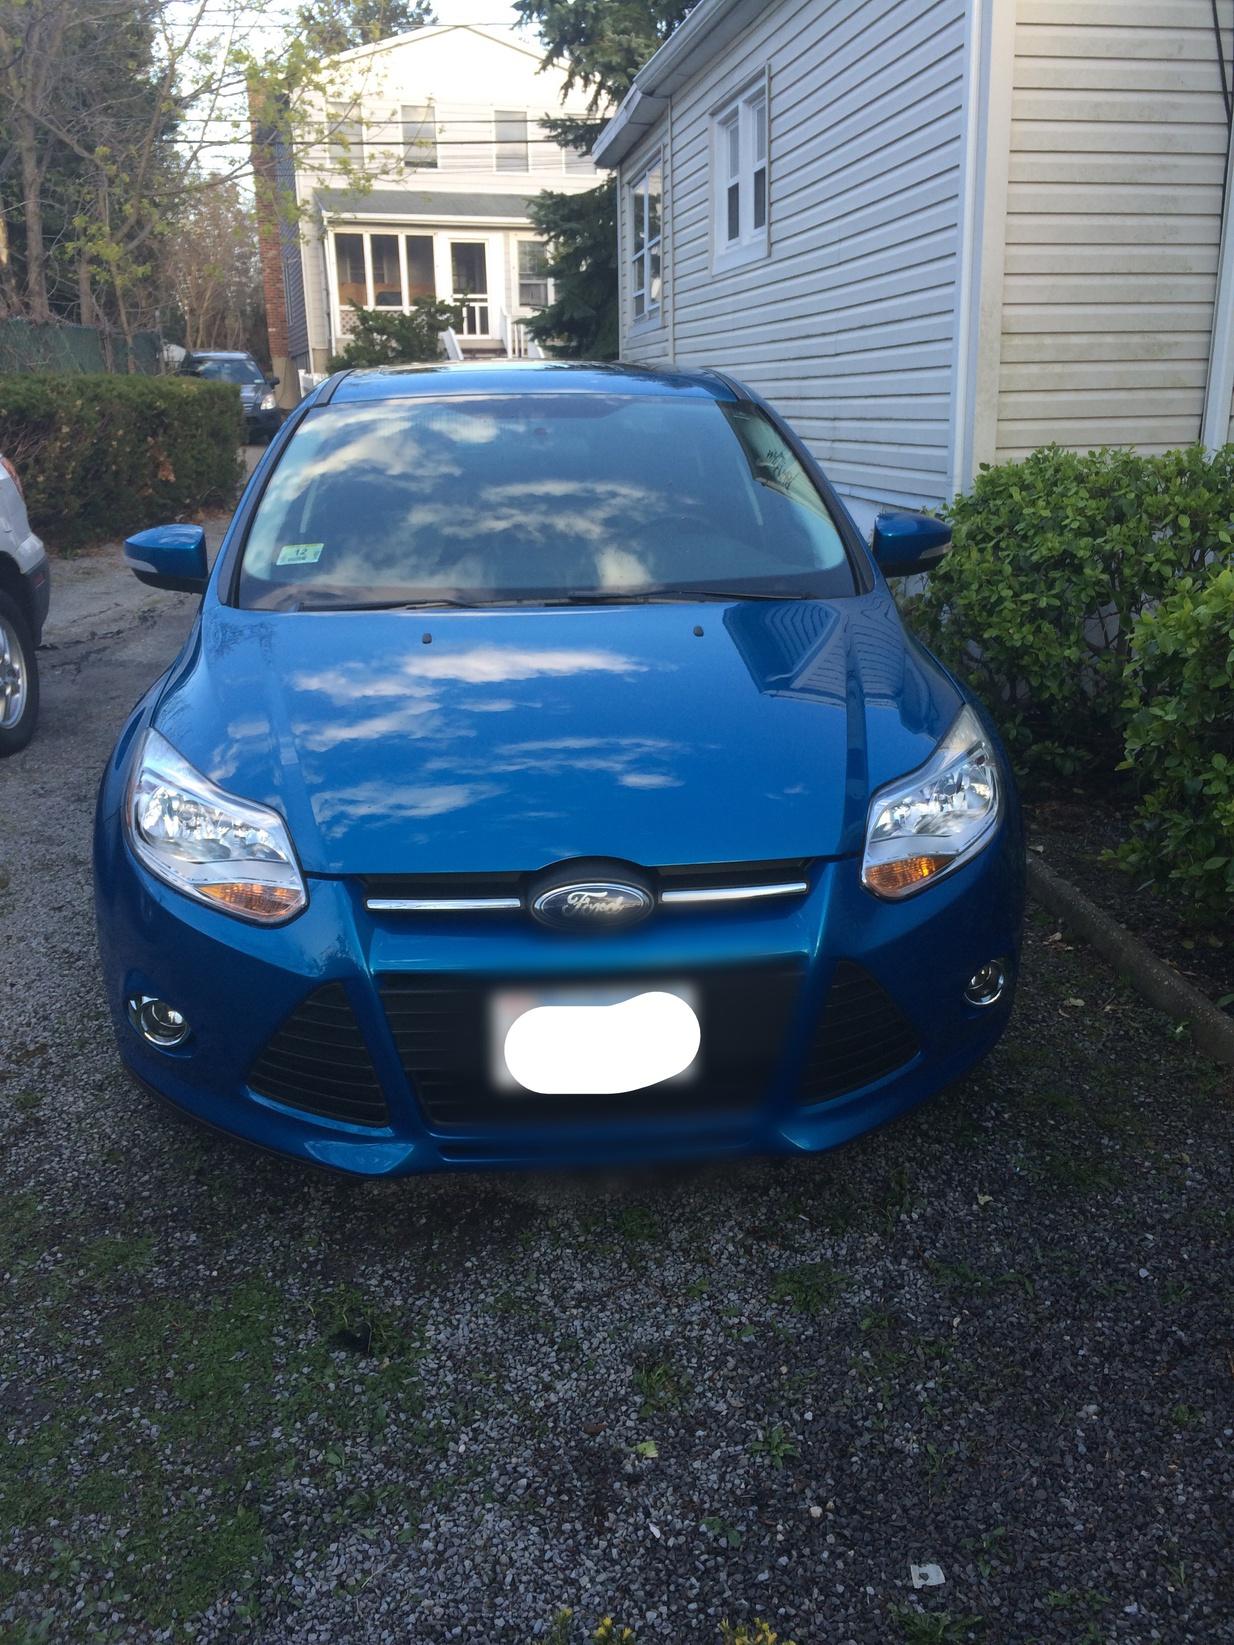 I LOVE my Mk3 Ford Focus 100% whoo hoo thread!!-image-1-.jpg